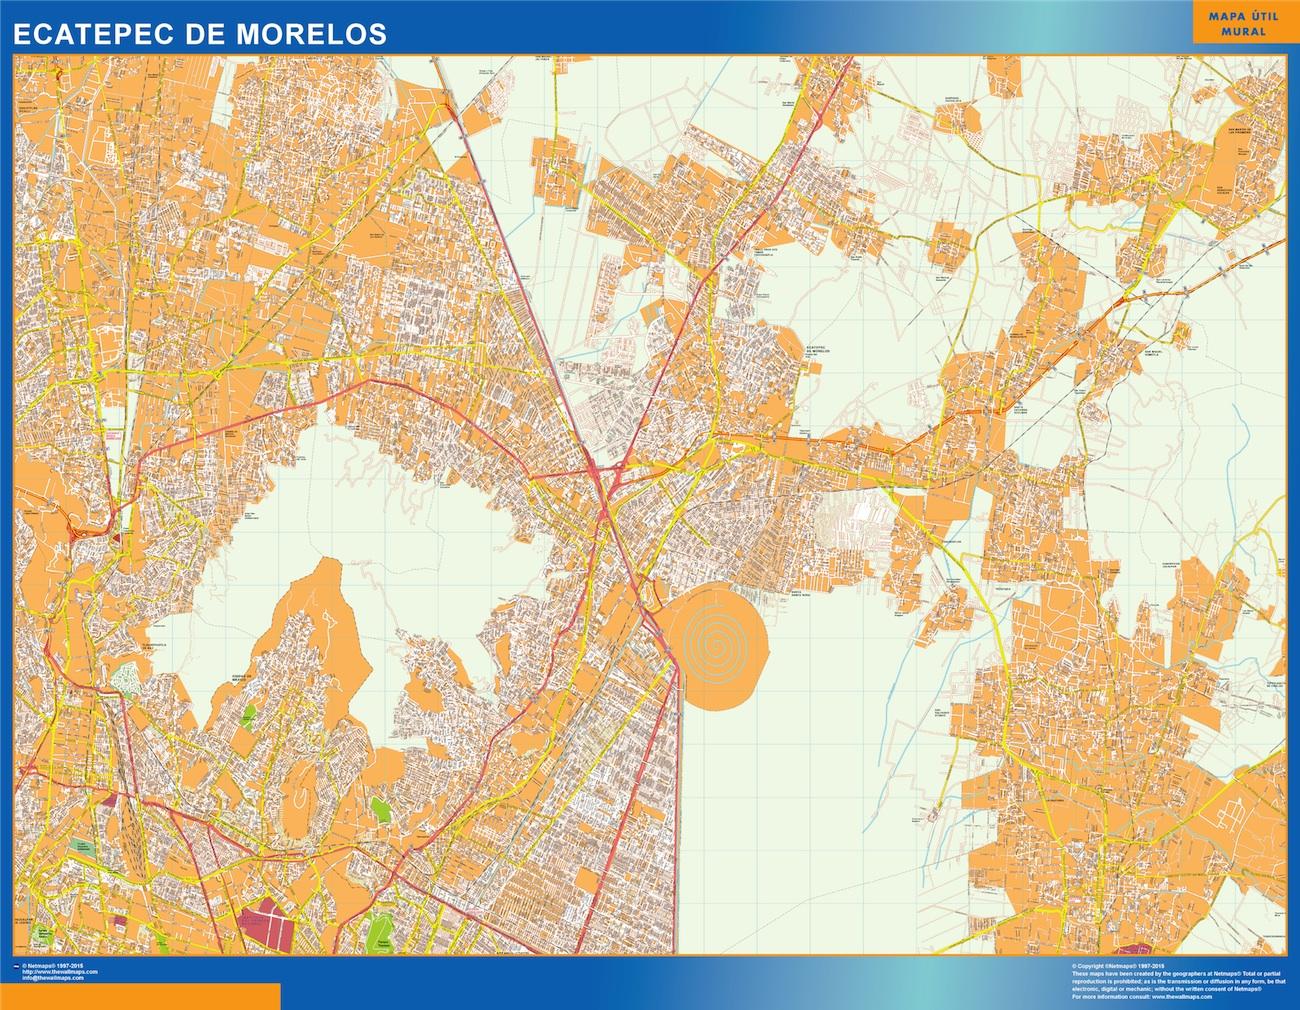 mapa Ecatepec de Morelos